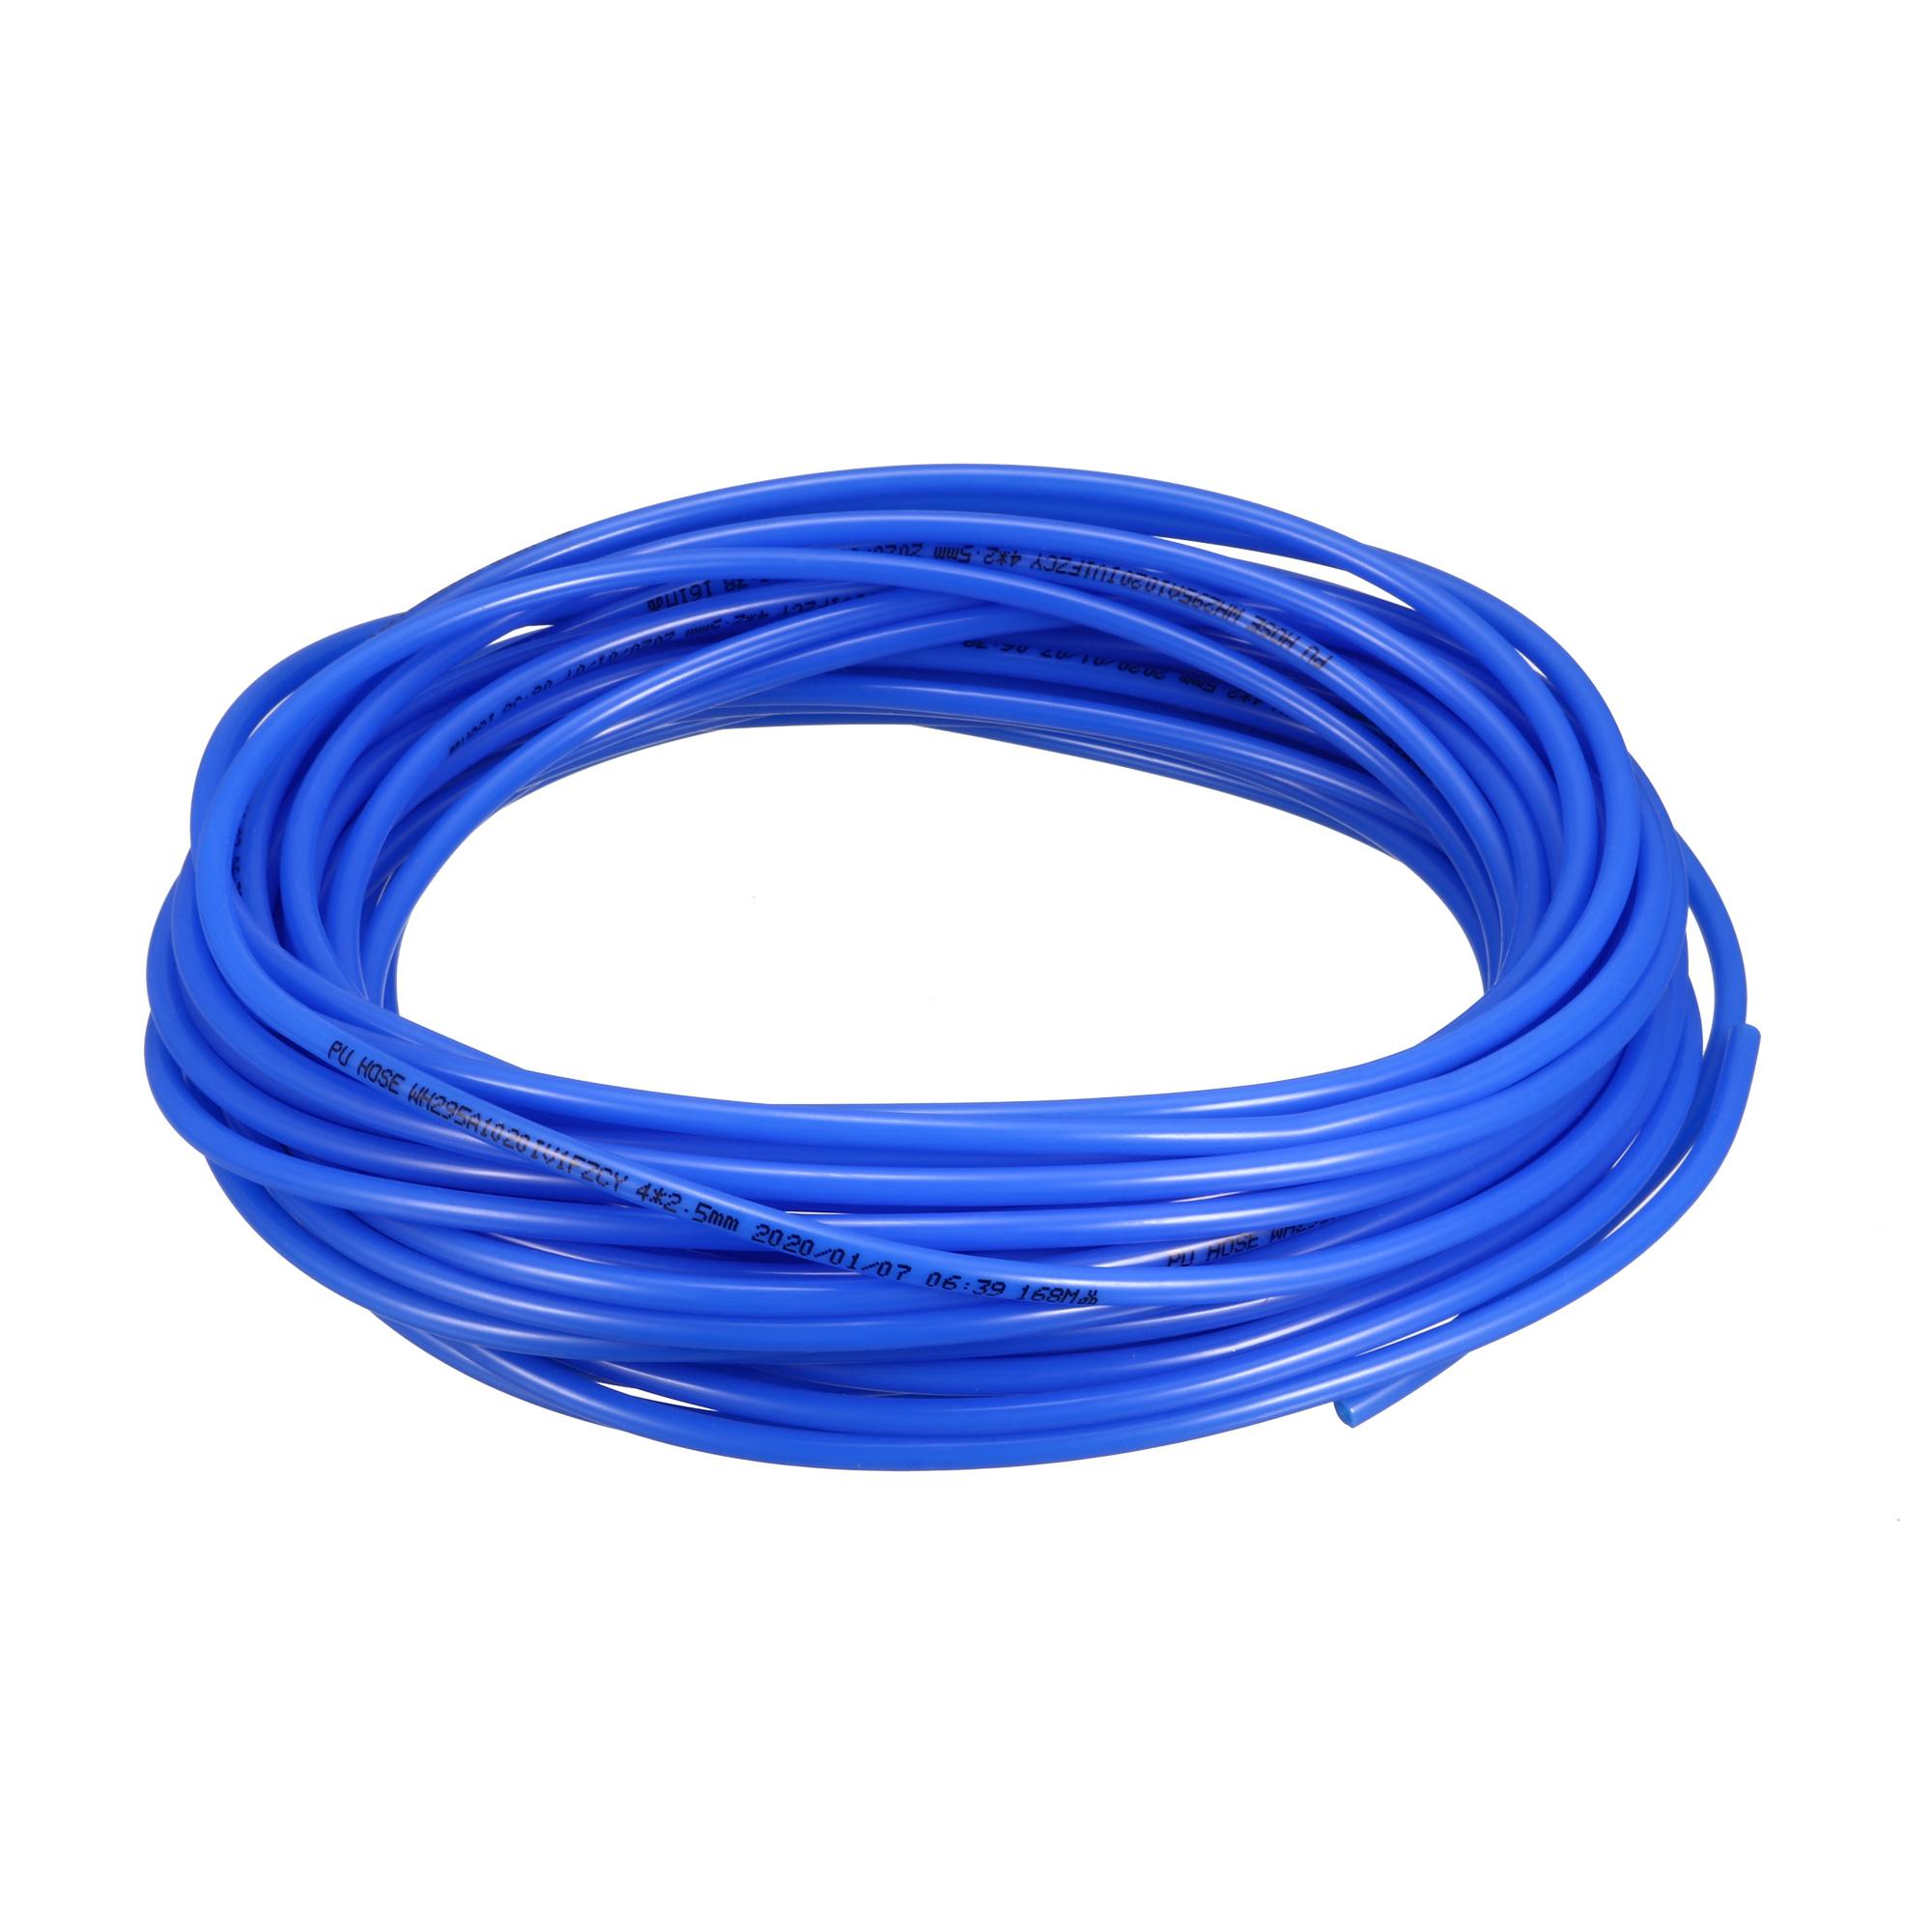 13.5 Meter Long 4mm x 2.5mm Blue Polyurethane Flexible Air Tube PU Tubing Pneumatic Pipe Hose